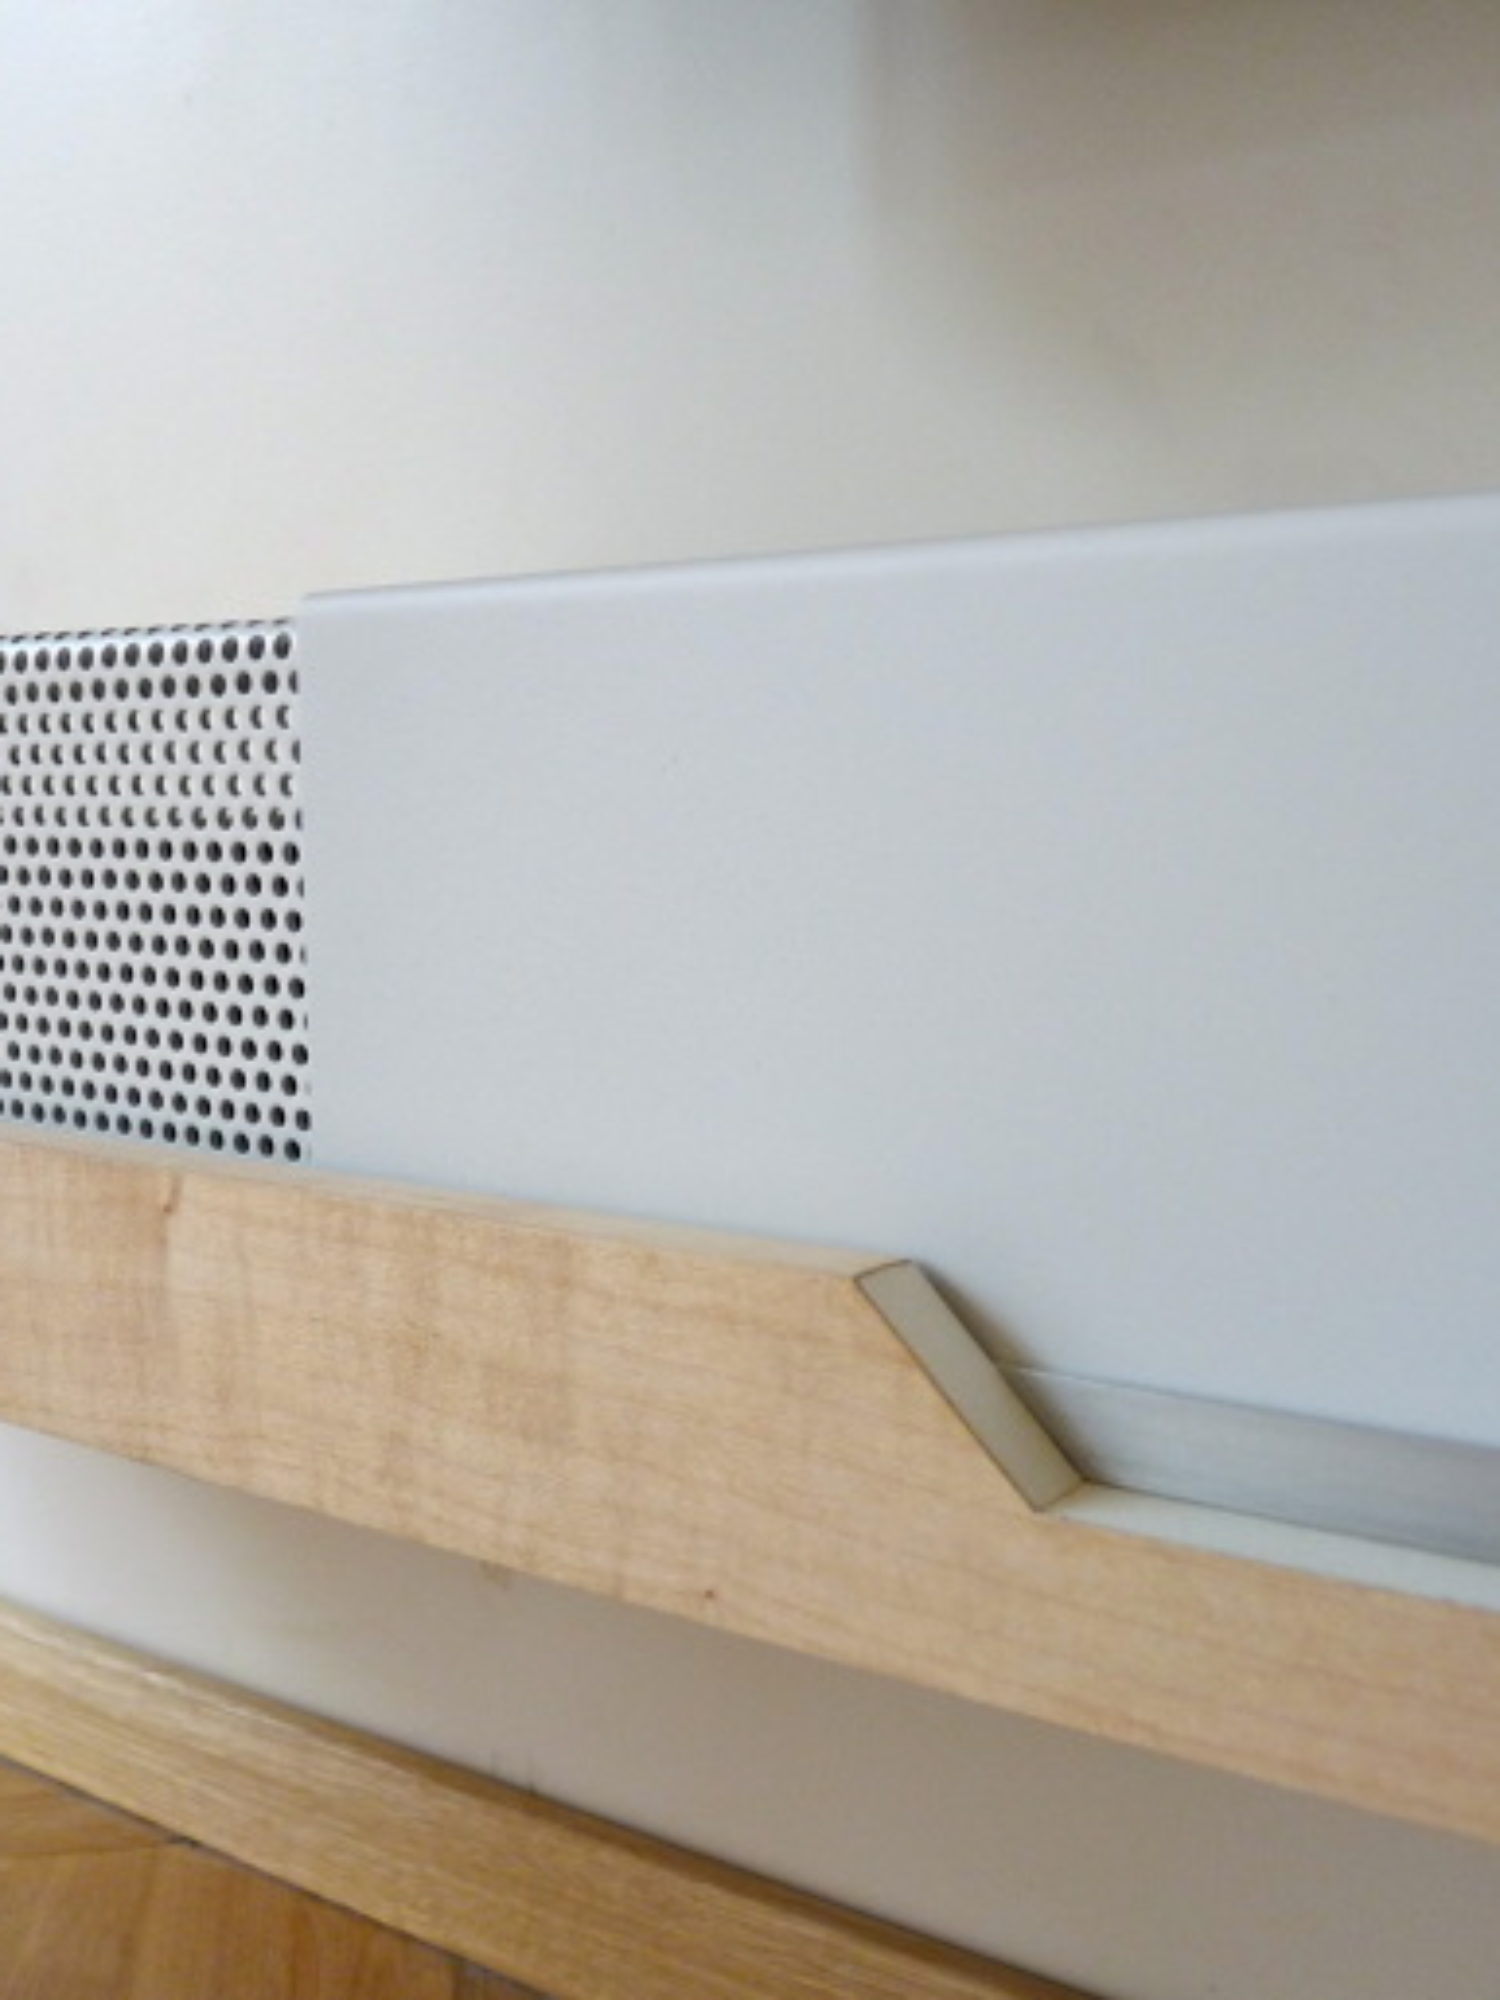 MEUBLE TV • Une solution de meuble sur-mesure suspendu, un design minimal